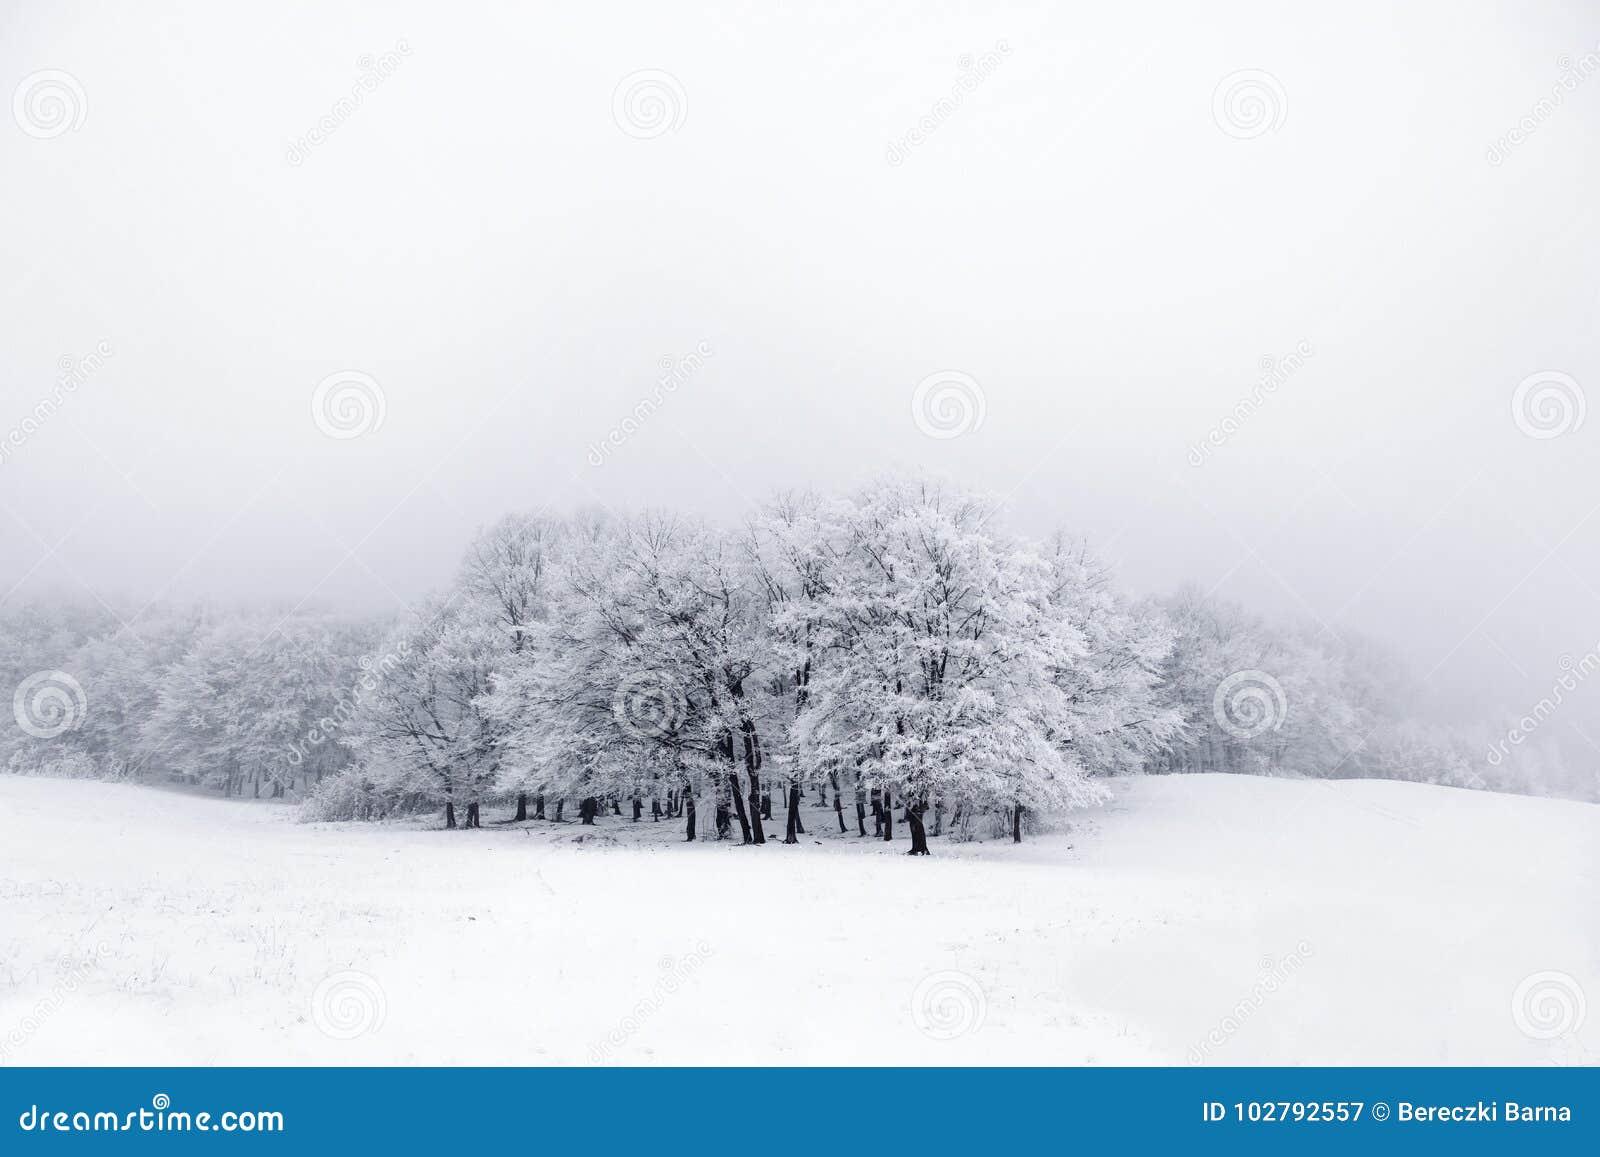 Ландшафт зимы: край леса в заморозке и морозном тумане